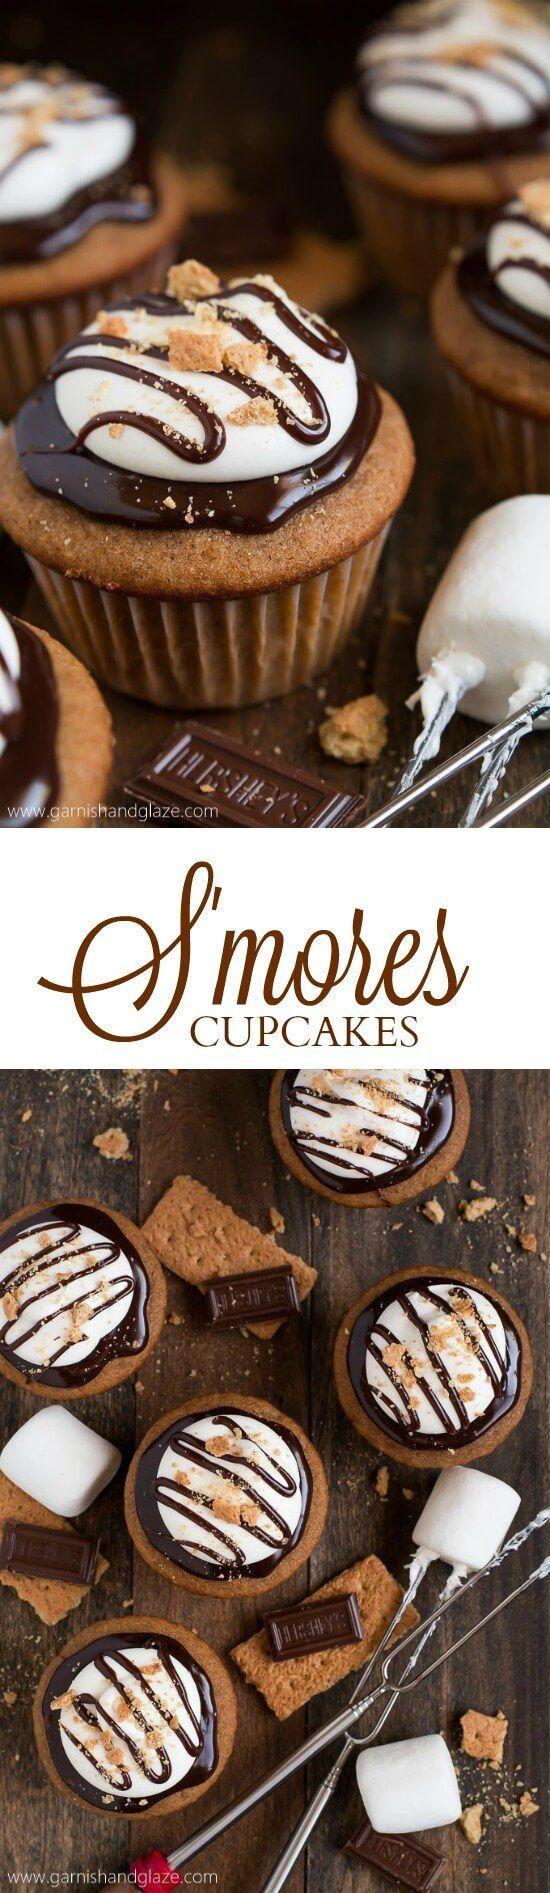 25+ best ideas about National dessert day on Pinterest   National ...